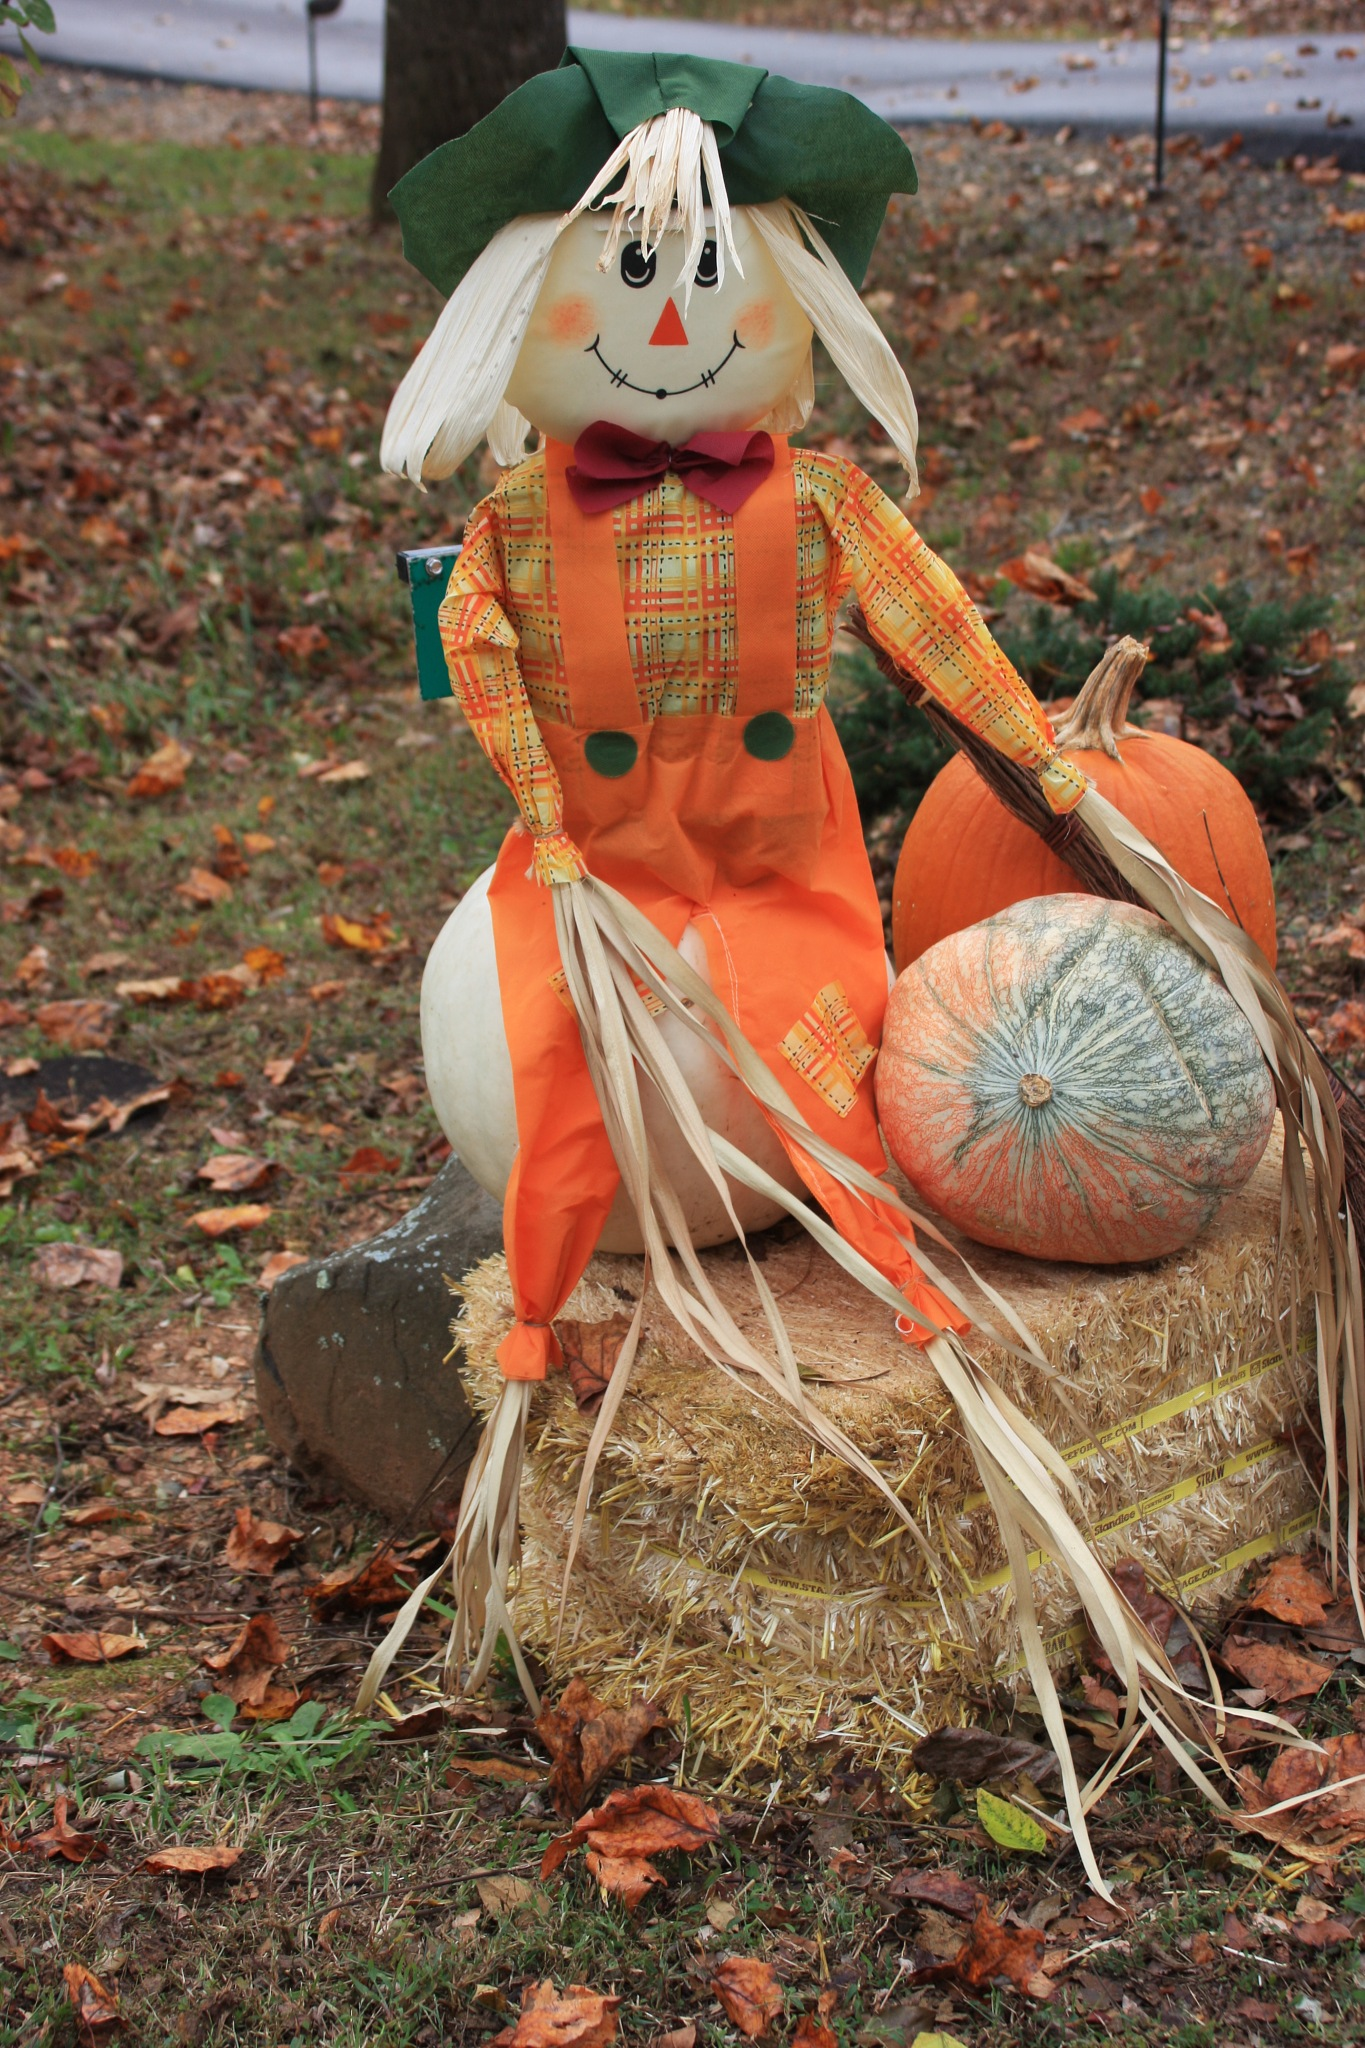 and Halloween is behind the corner by Jaroslav Reznicek